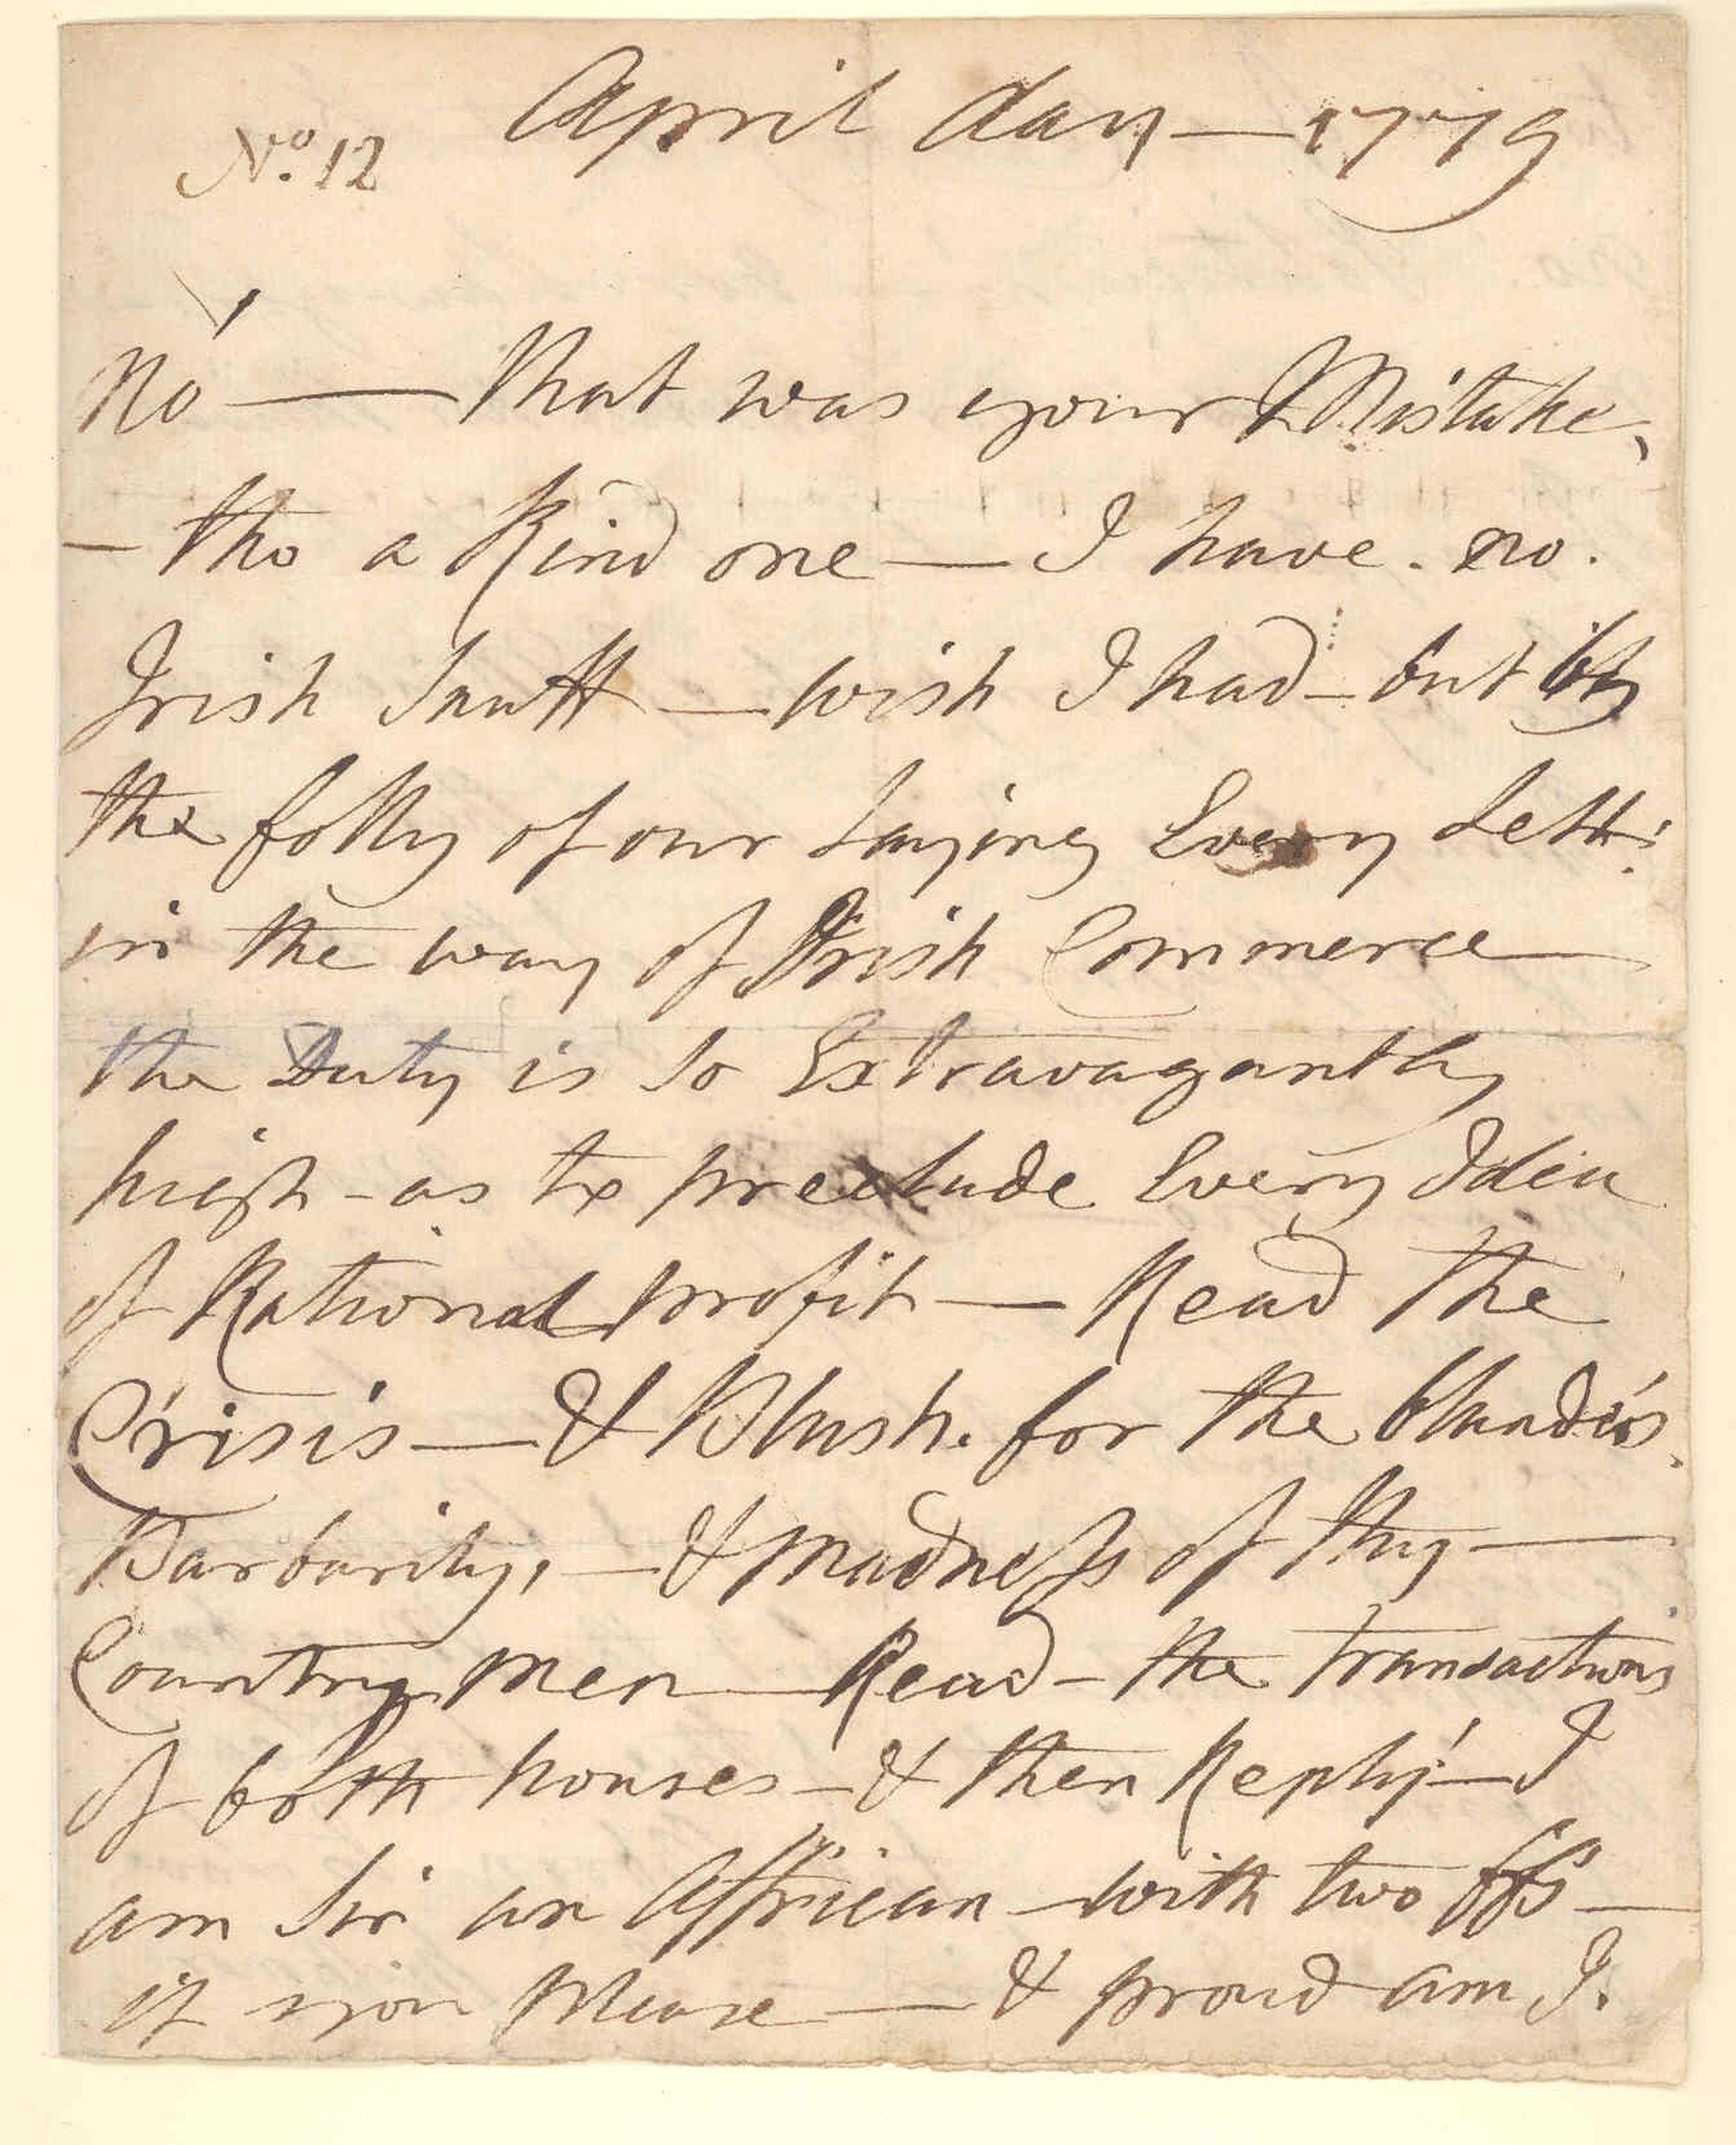 Letter from Ignatius Sancho to William Stevenson, April 1779.